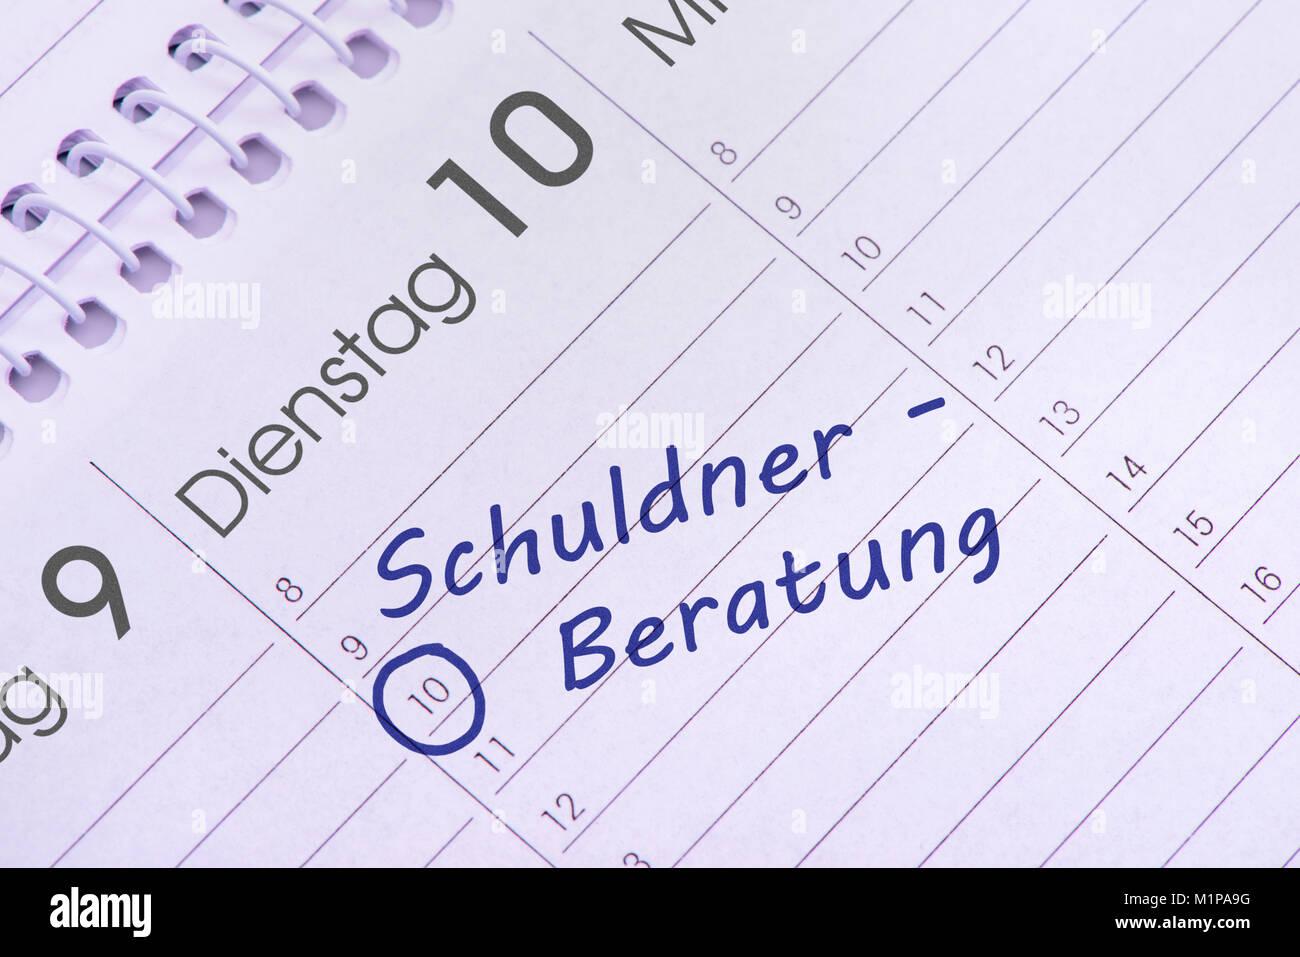 Schuldnerberatung Termin im Kalender Stock Photo